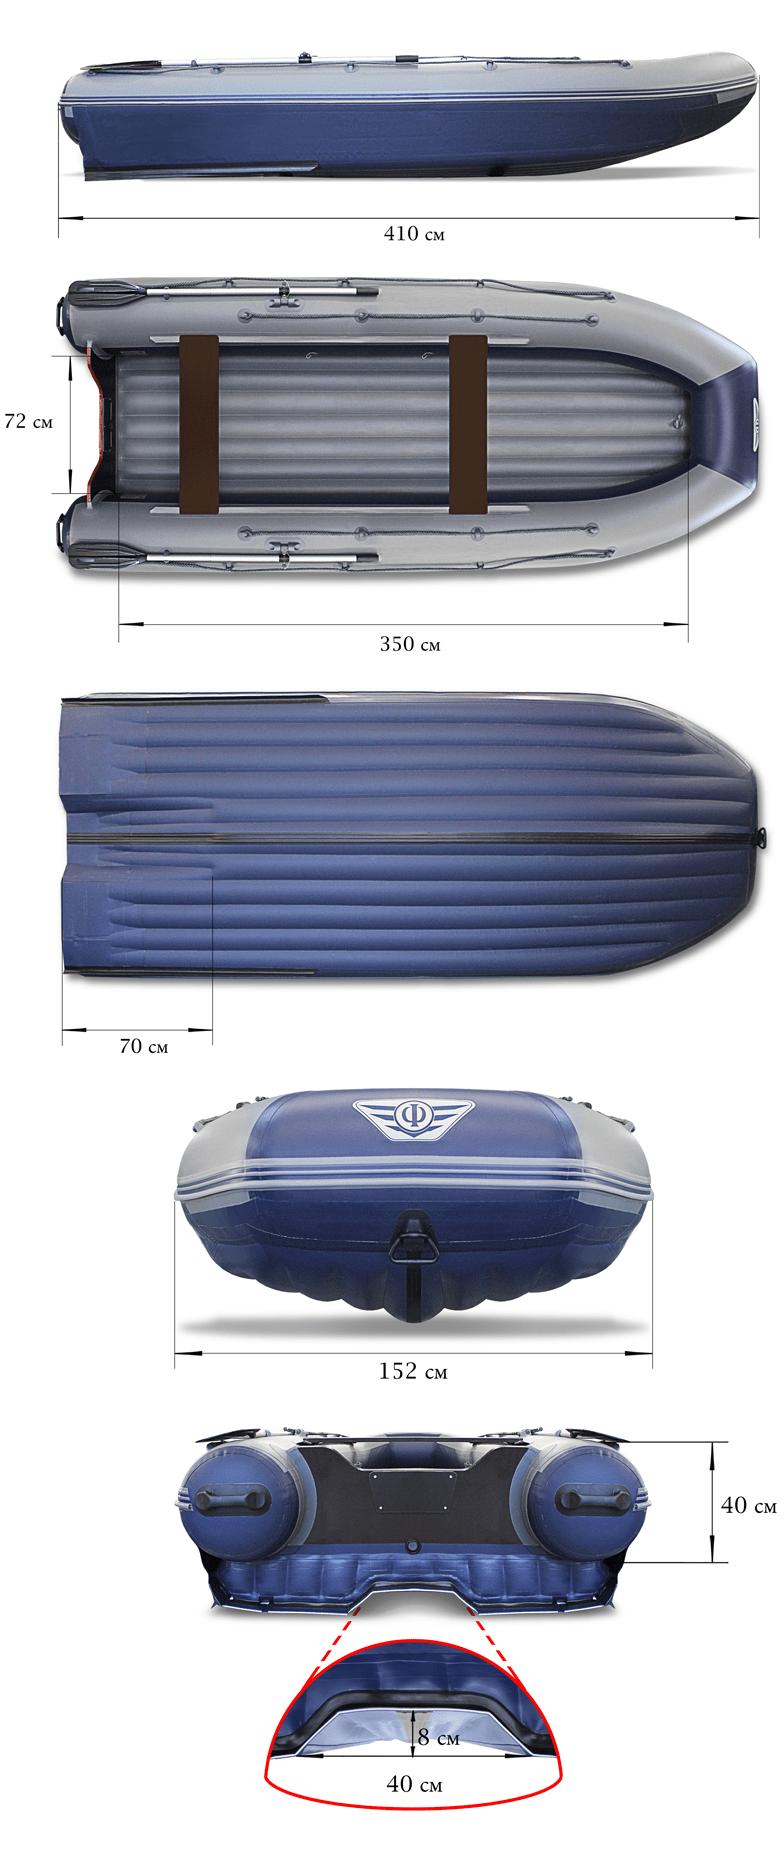 ФЛАГМАН DK 410i Jet